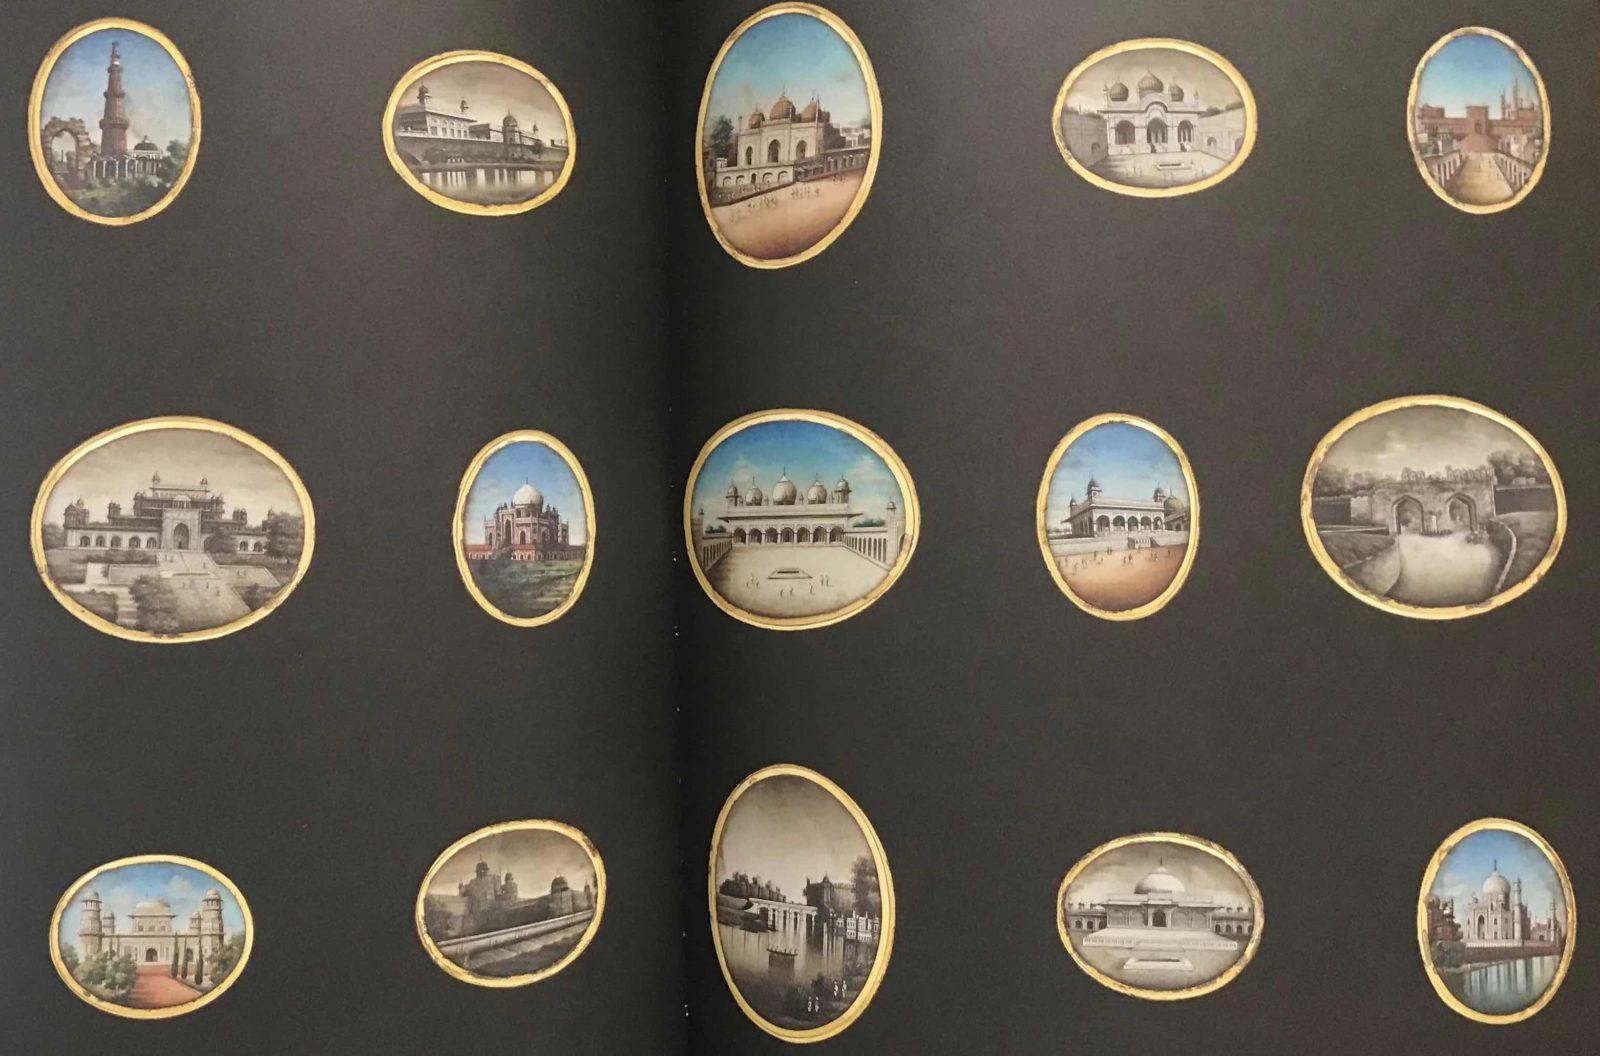 Publication exposition Gustave Revilliod Ariana Genève Médaillons famille